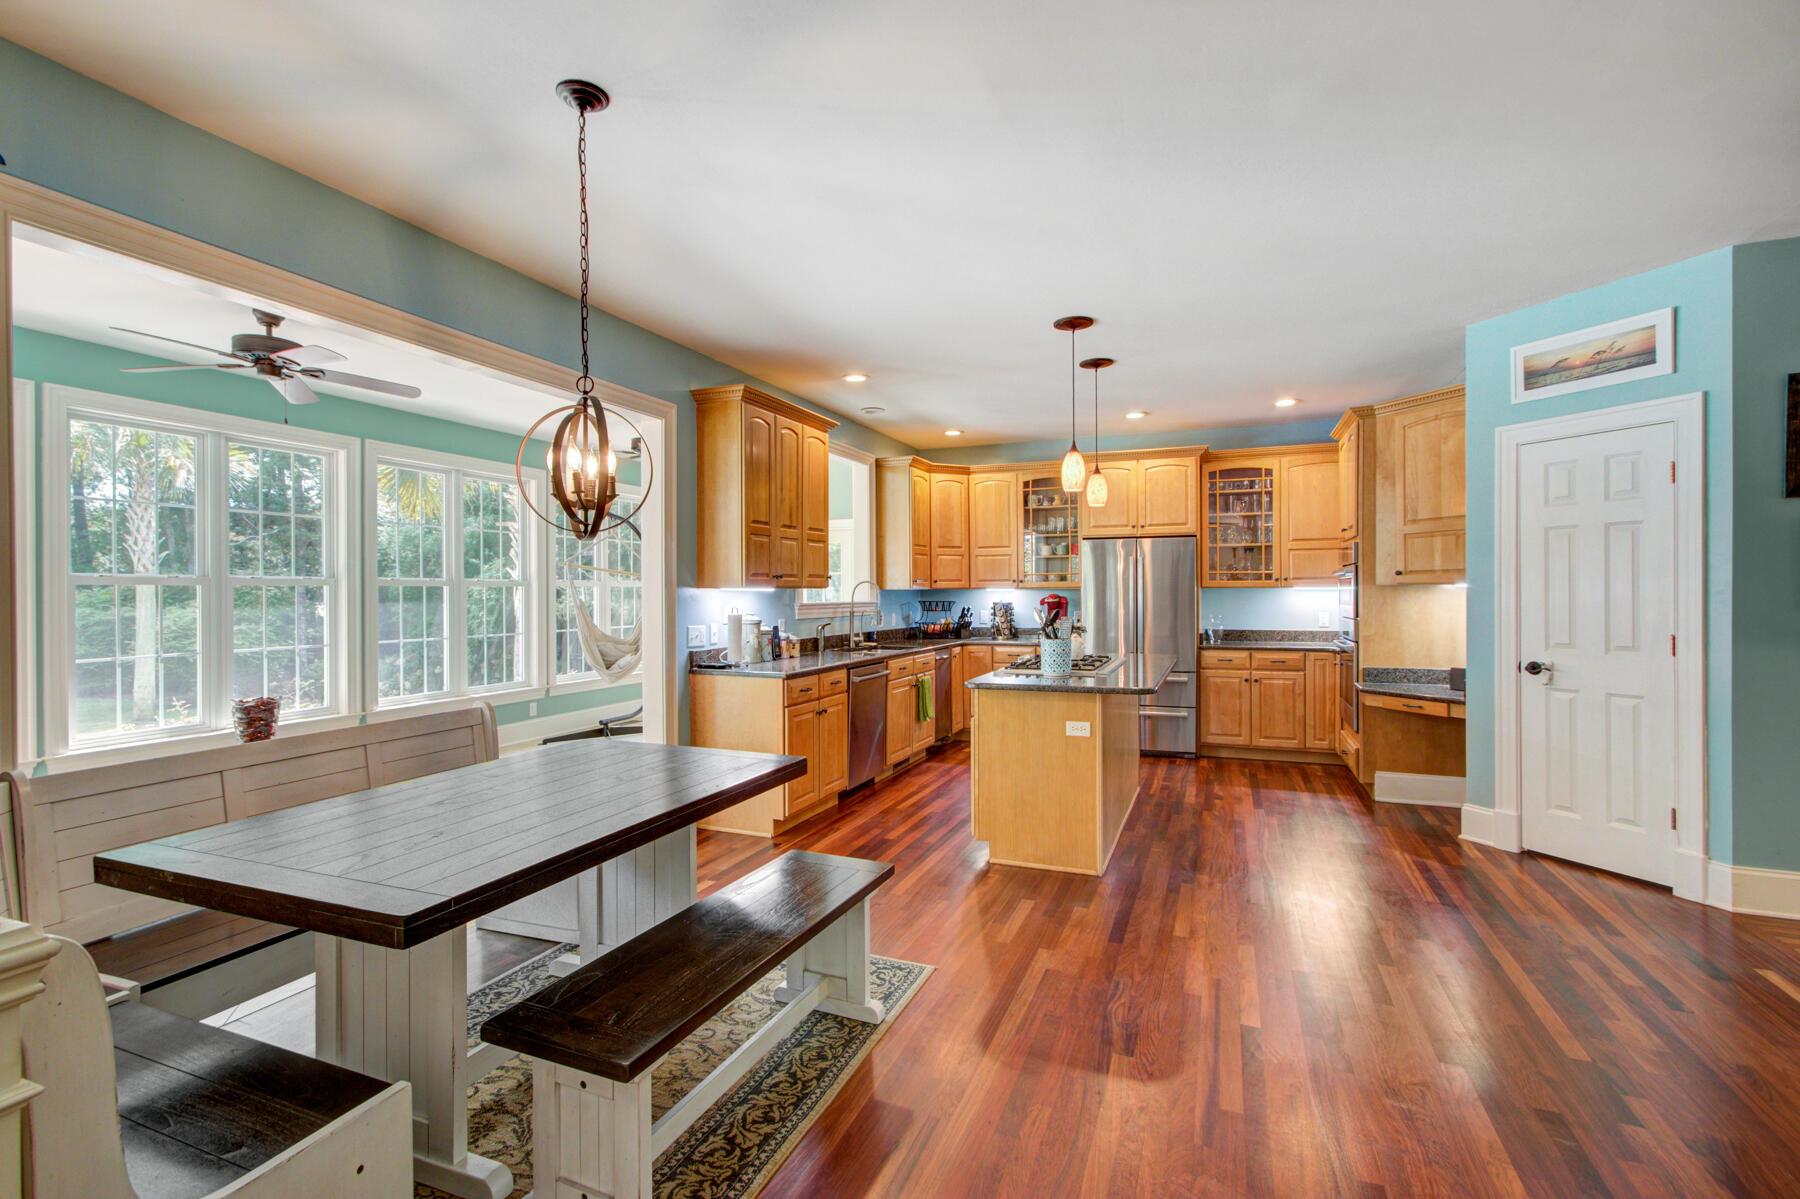 Dunes West Homes For Sale - 3095 Pignatelli, Mount Pleasant, SC - 4